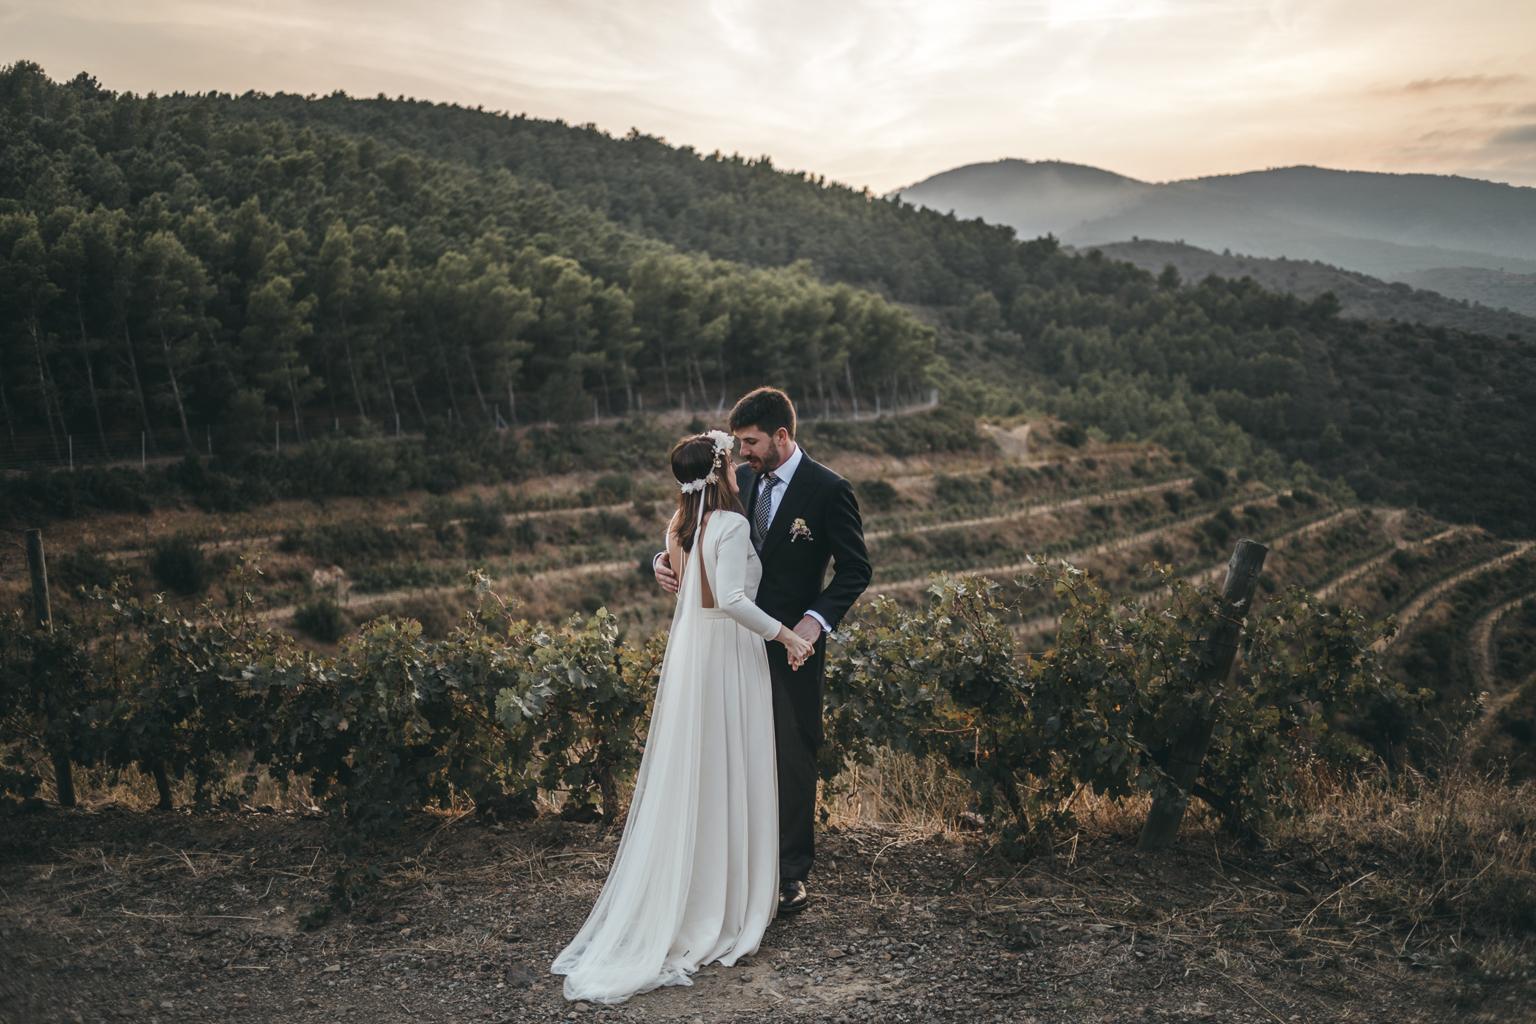 fotógrafo postboda Portbou :: fotógrafo de boda Barcelona :: Barcelona wedding photographer :: costa brava photographer :: Fotógrafo de bodas Sant Cugat